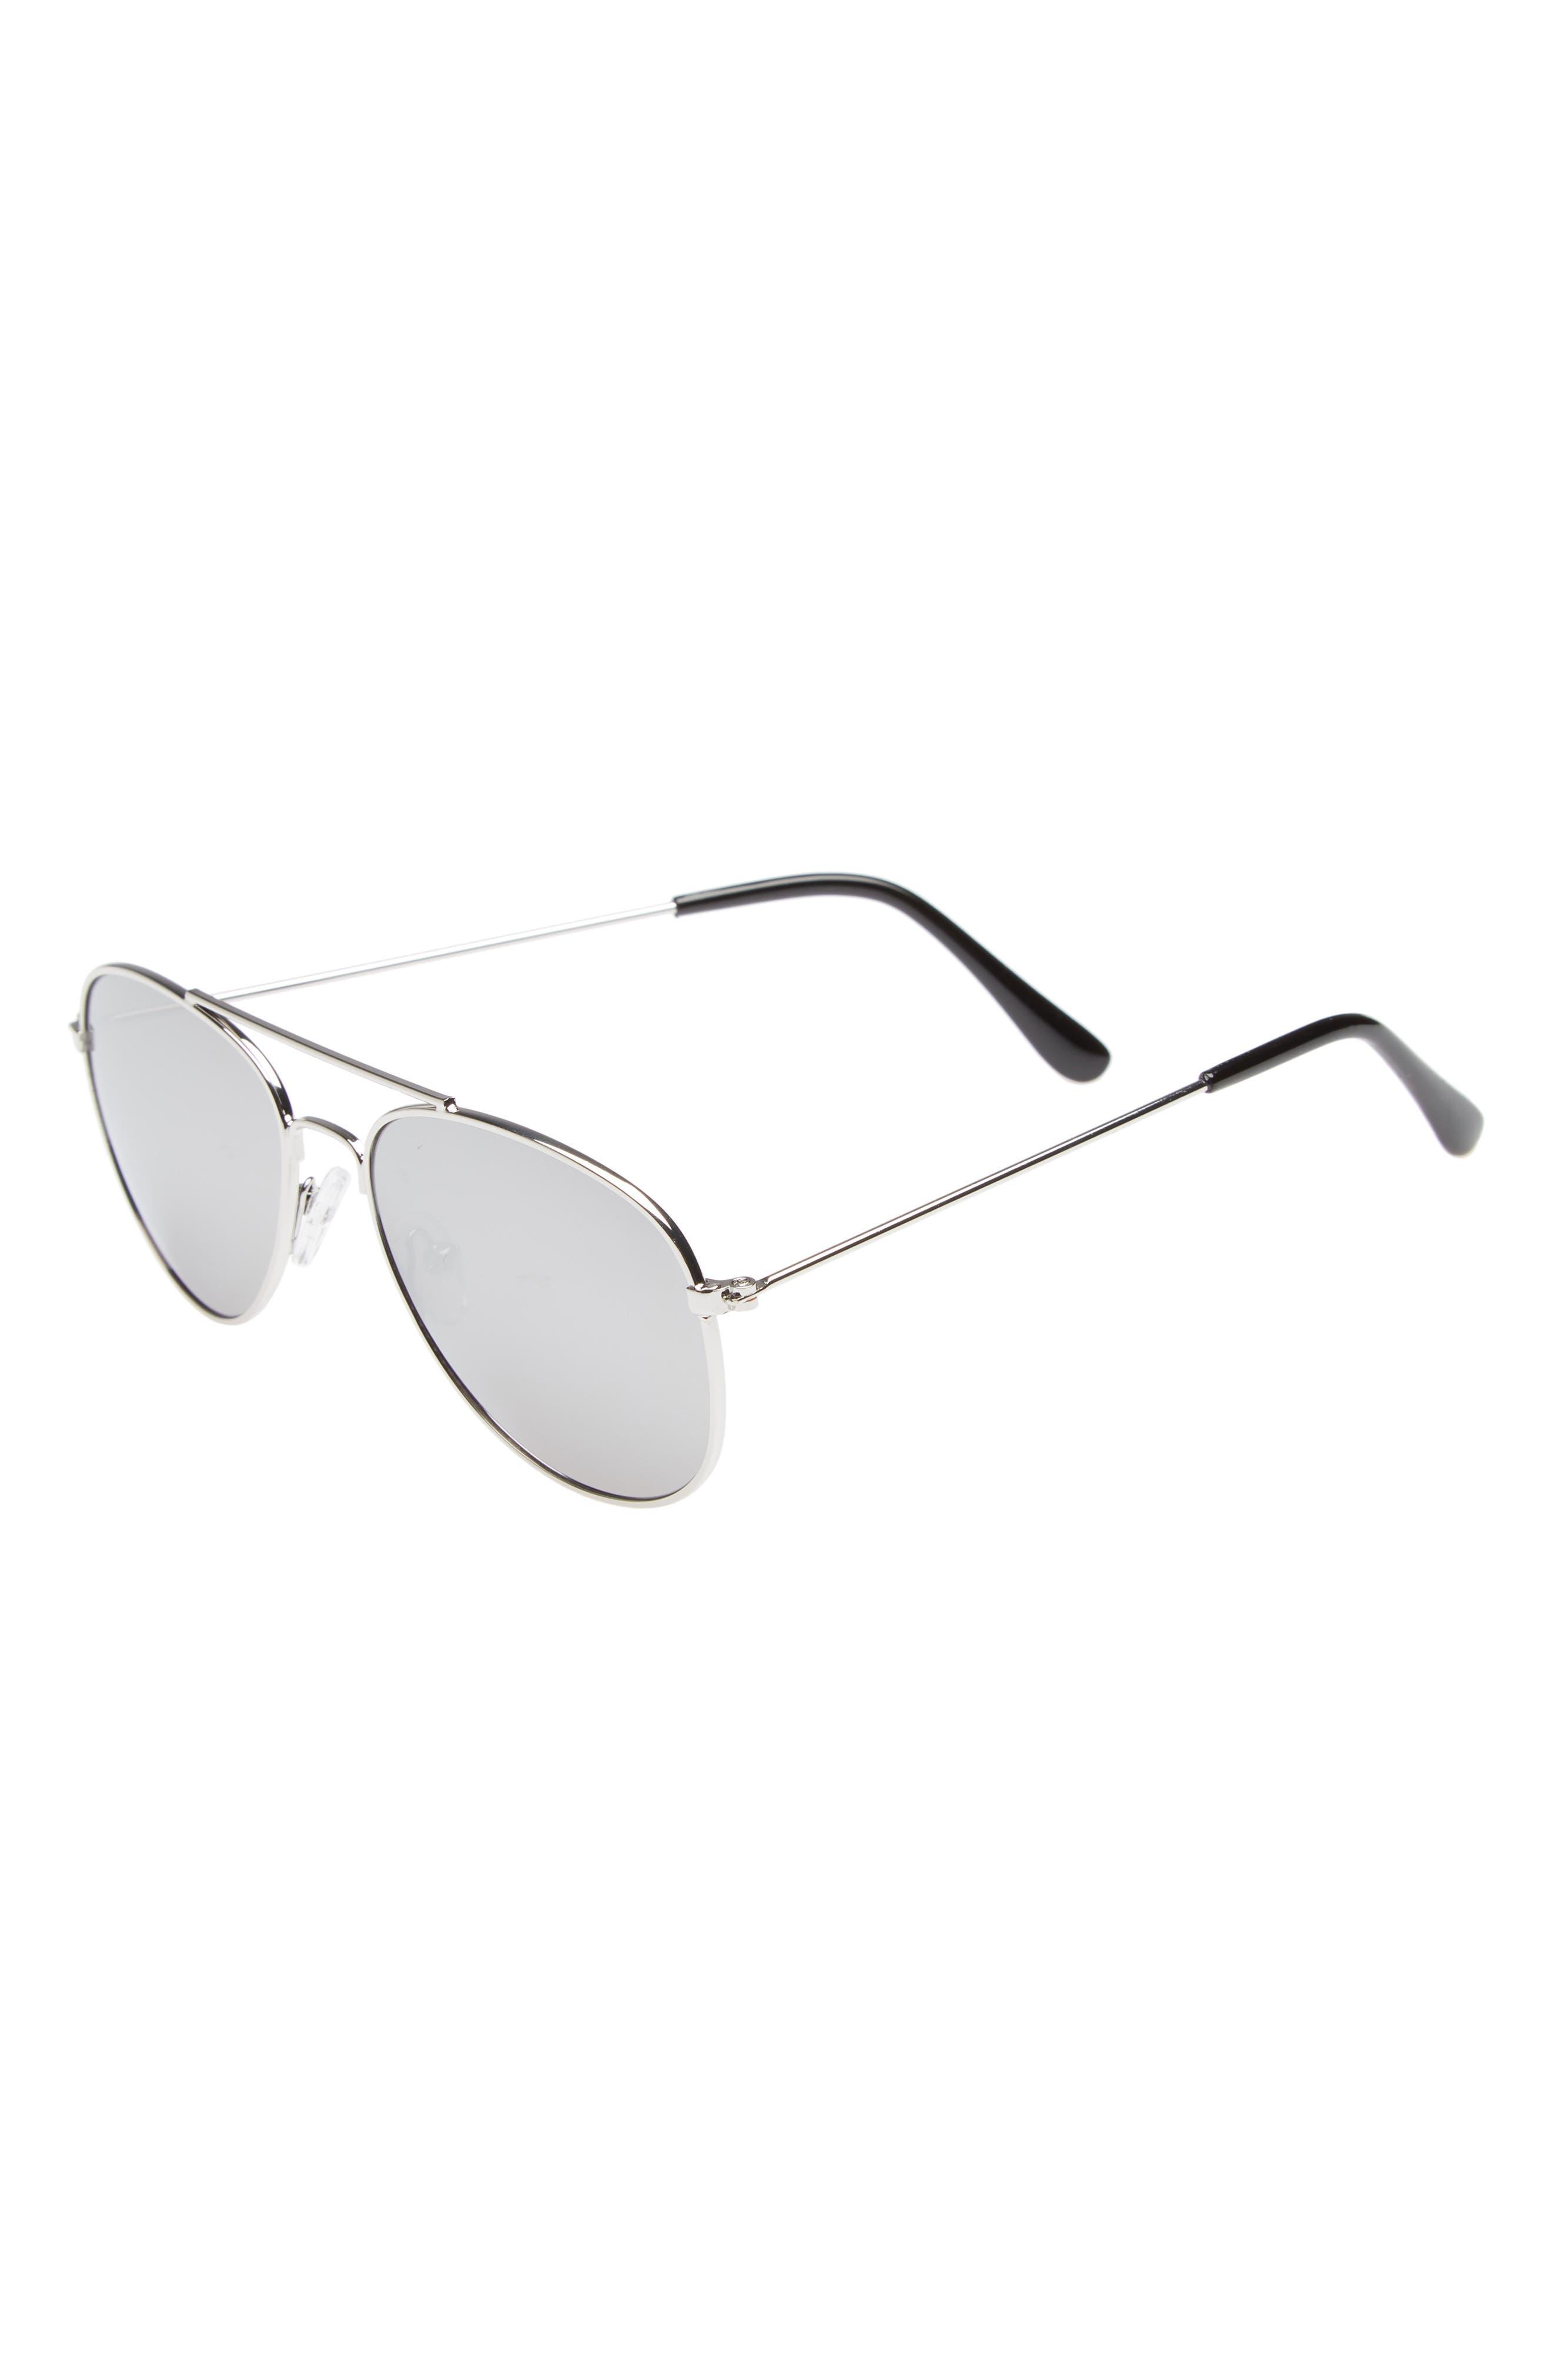 50mm Mirrored Aviator Sunglasses,                         Main,                         color, SILVER COMBO